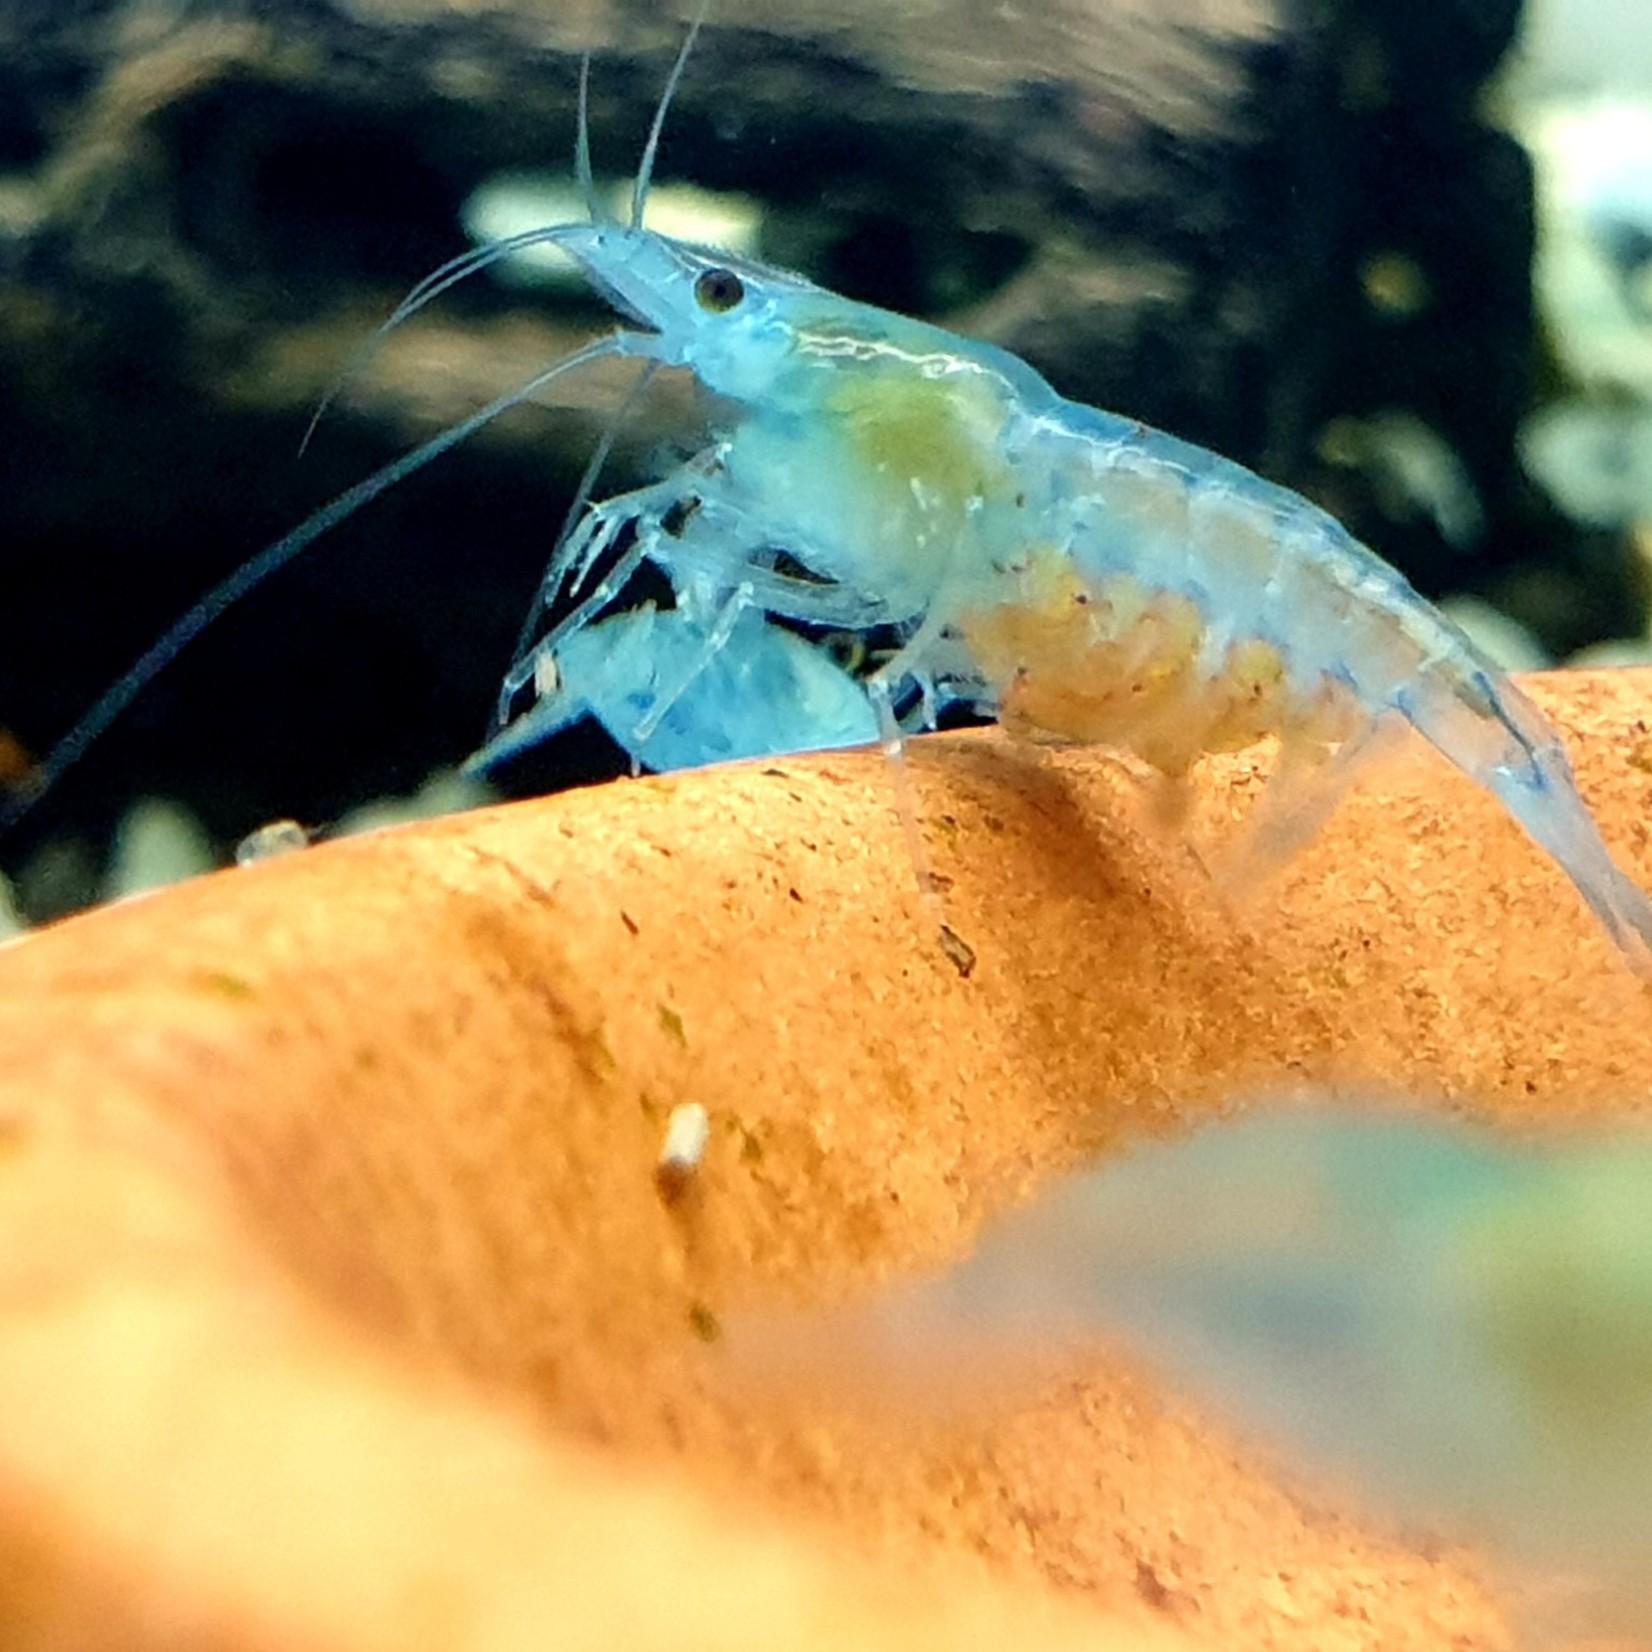 Bubba's Shrimps Garnalen Neocaridina davidi var. Full Blue Rili - gelei